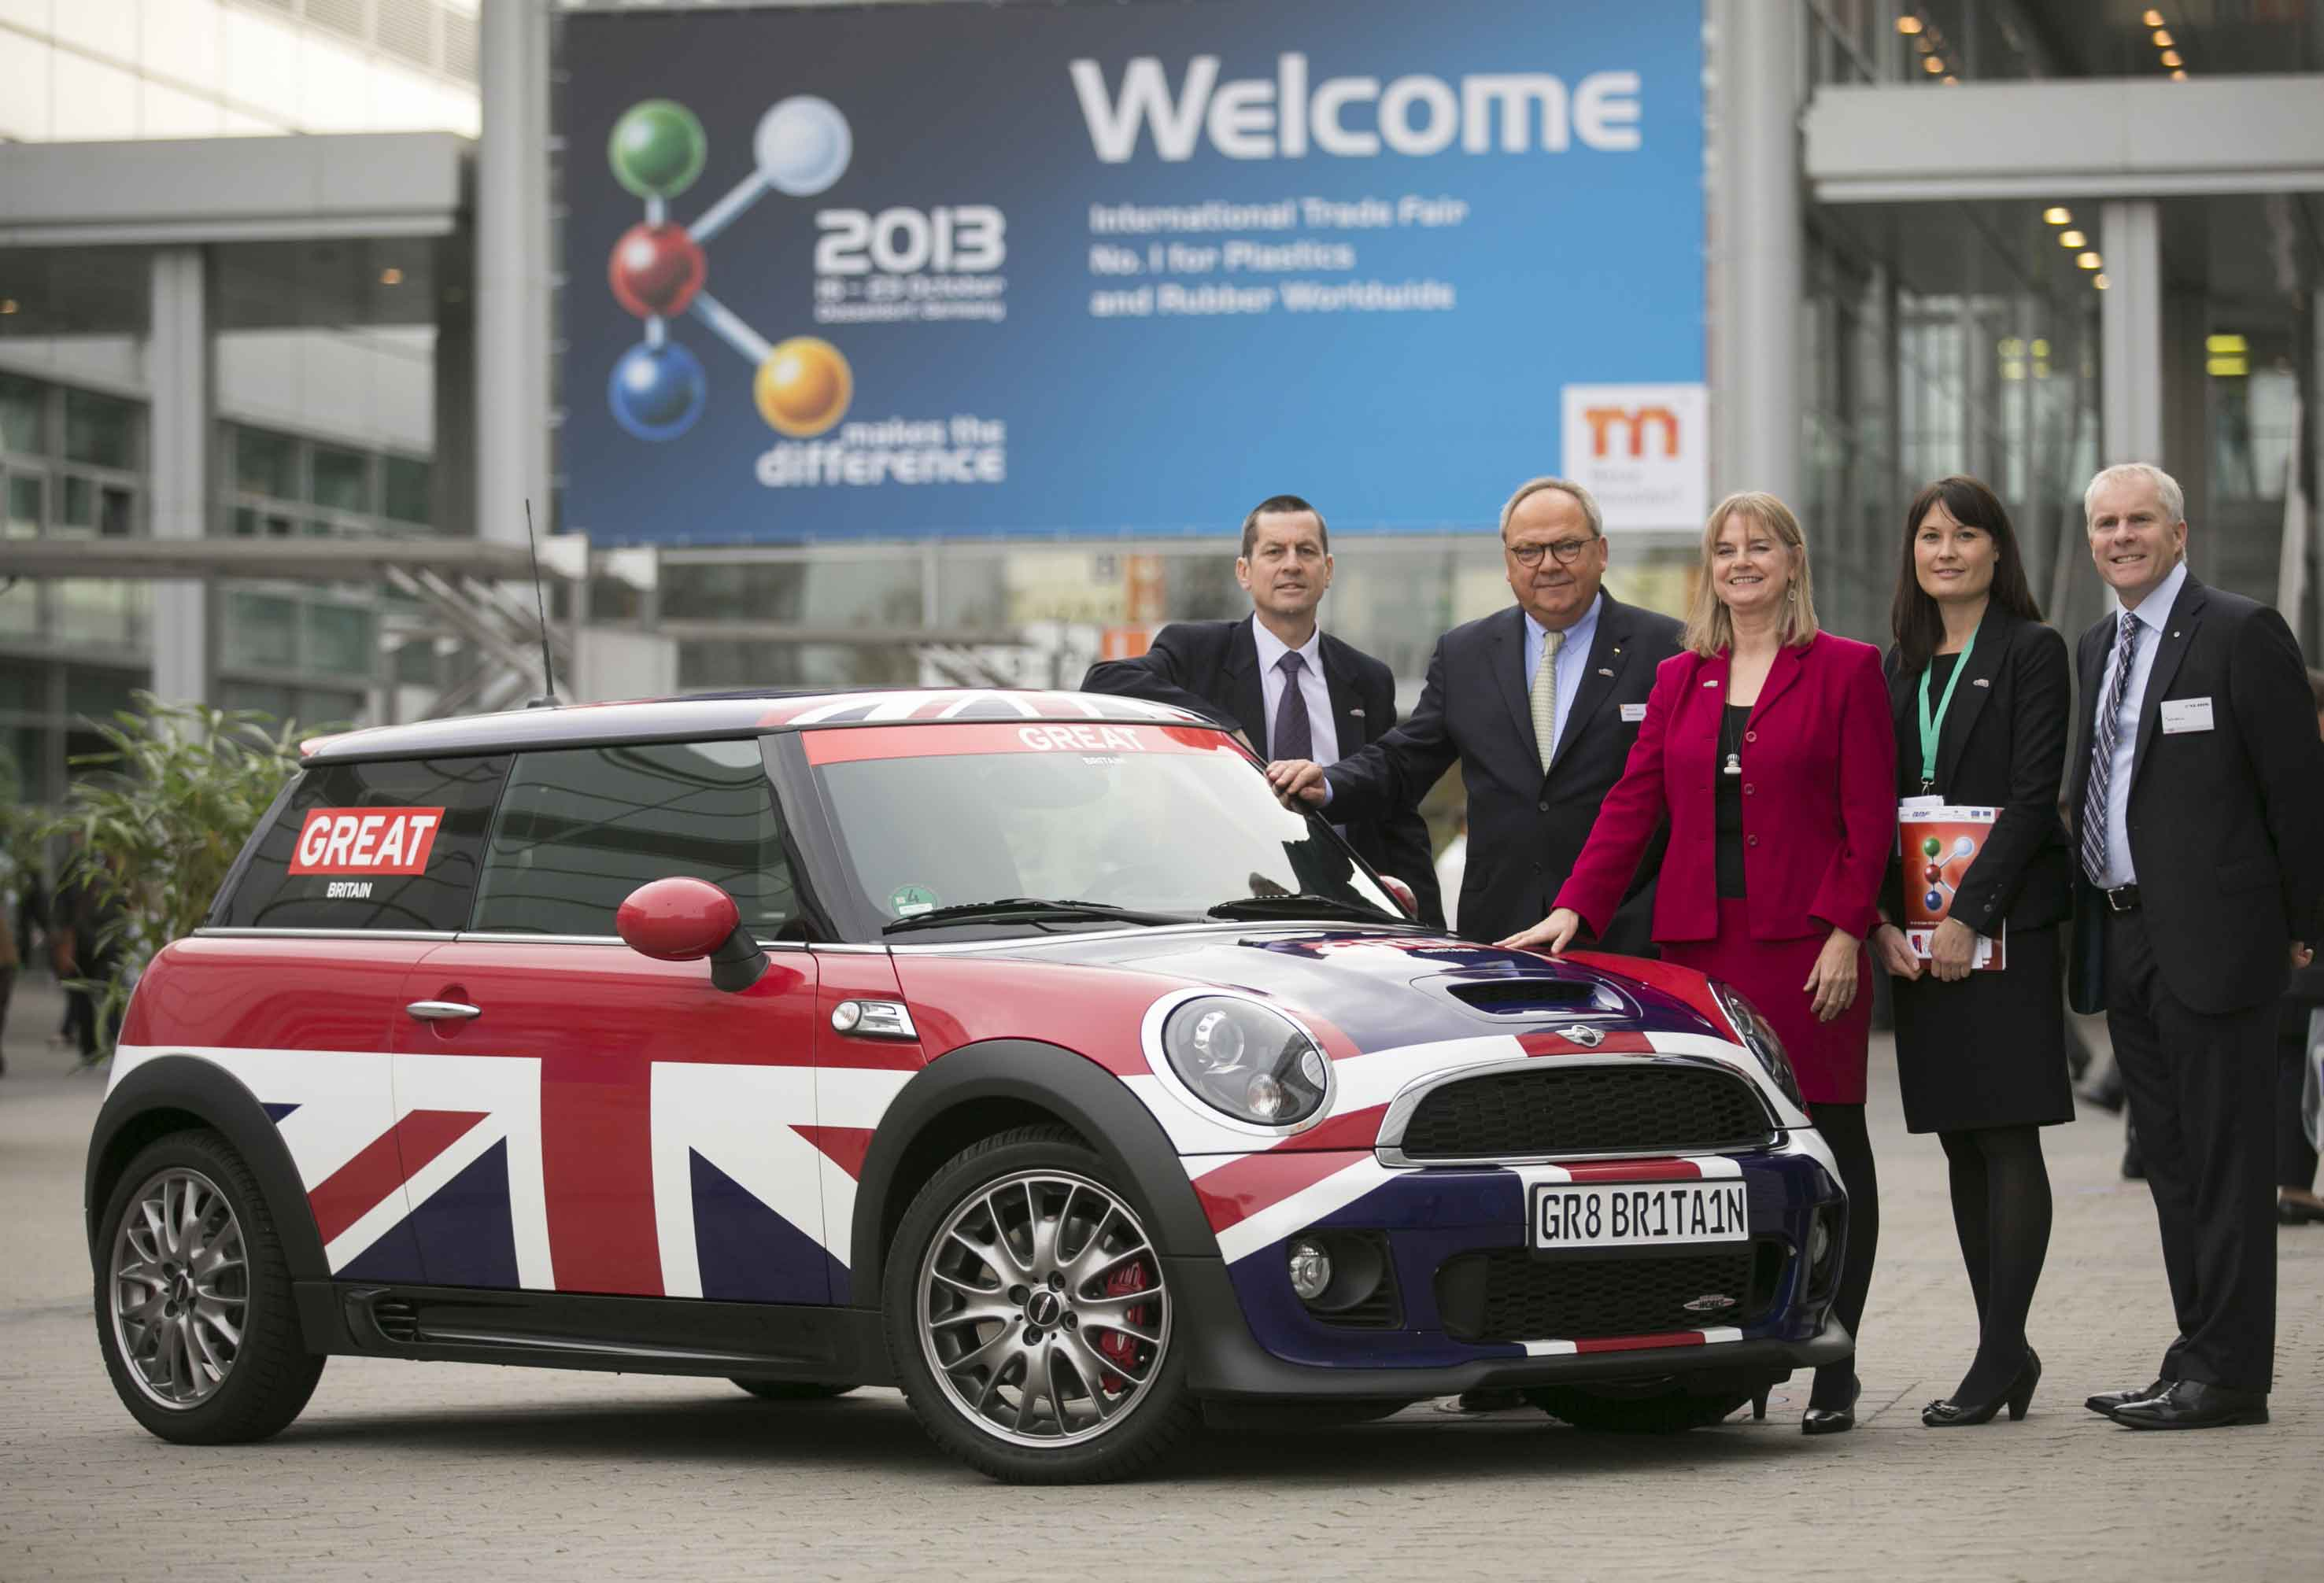 BPF Helps Push Mini Cooper in Dusseldorf